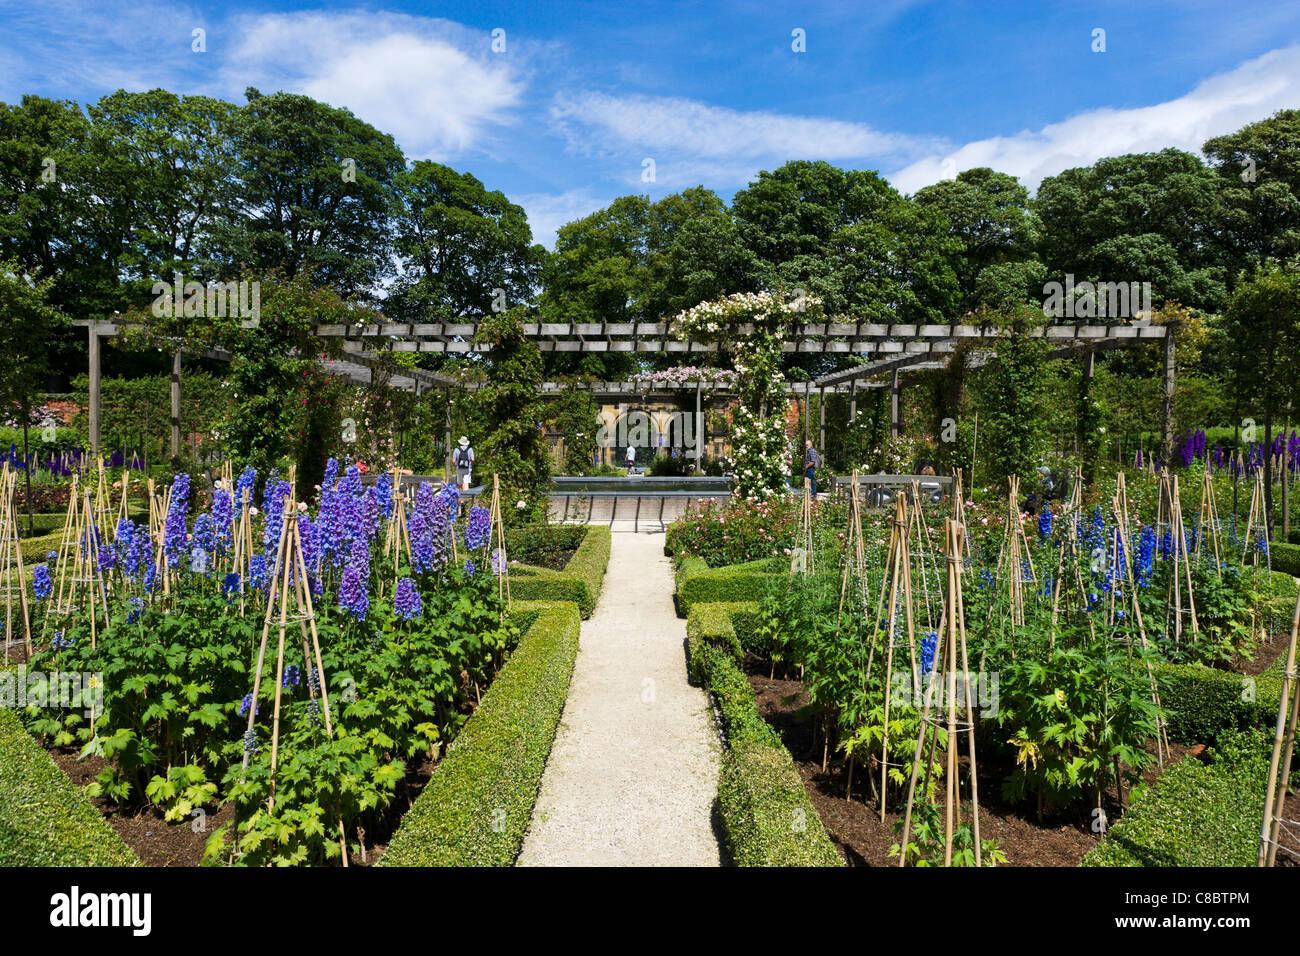 Ornamental Garden, The Alnwick Garden, Alnwick Castle, Alnwick, Northumberland, North East England, UK - Stock Image